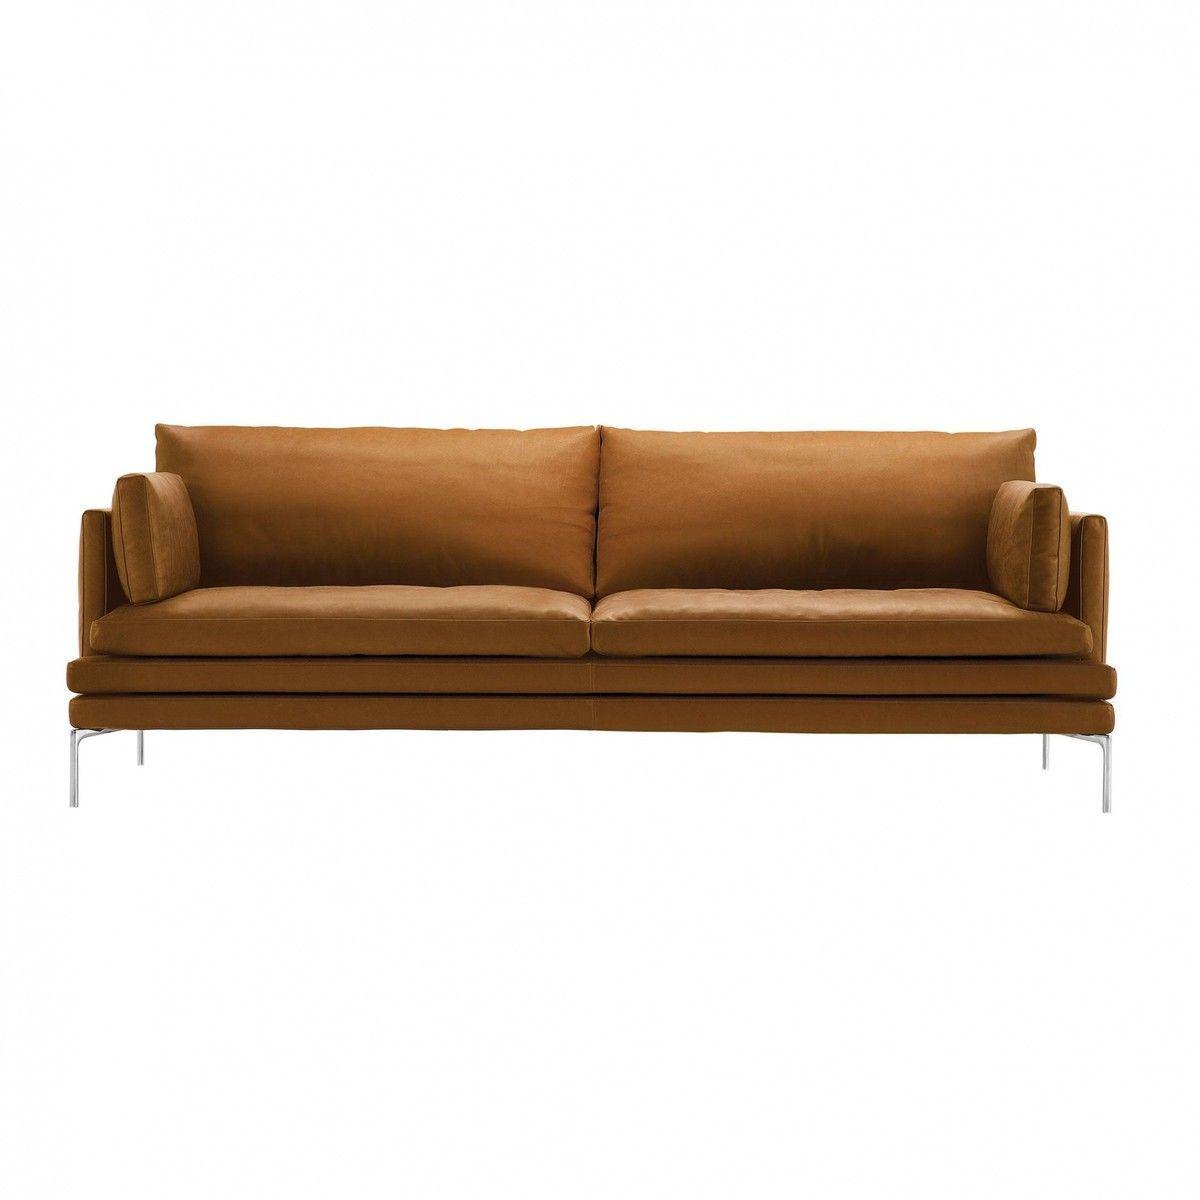 Zanotta William 2 Sitzer Sofa 224x87x90cm Cognac Leder Naturale Extra 0414 Gestell Alu Silber Inkl 2 Kissen 224 55x30cm Sofa Sofa Design Seating